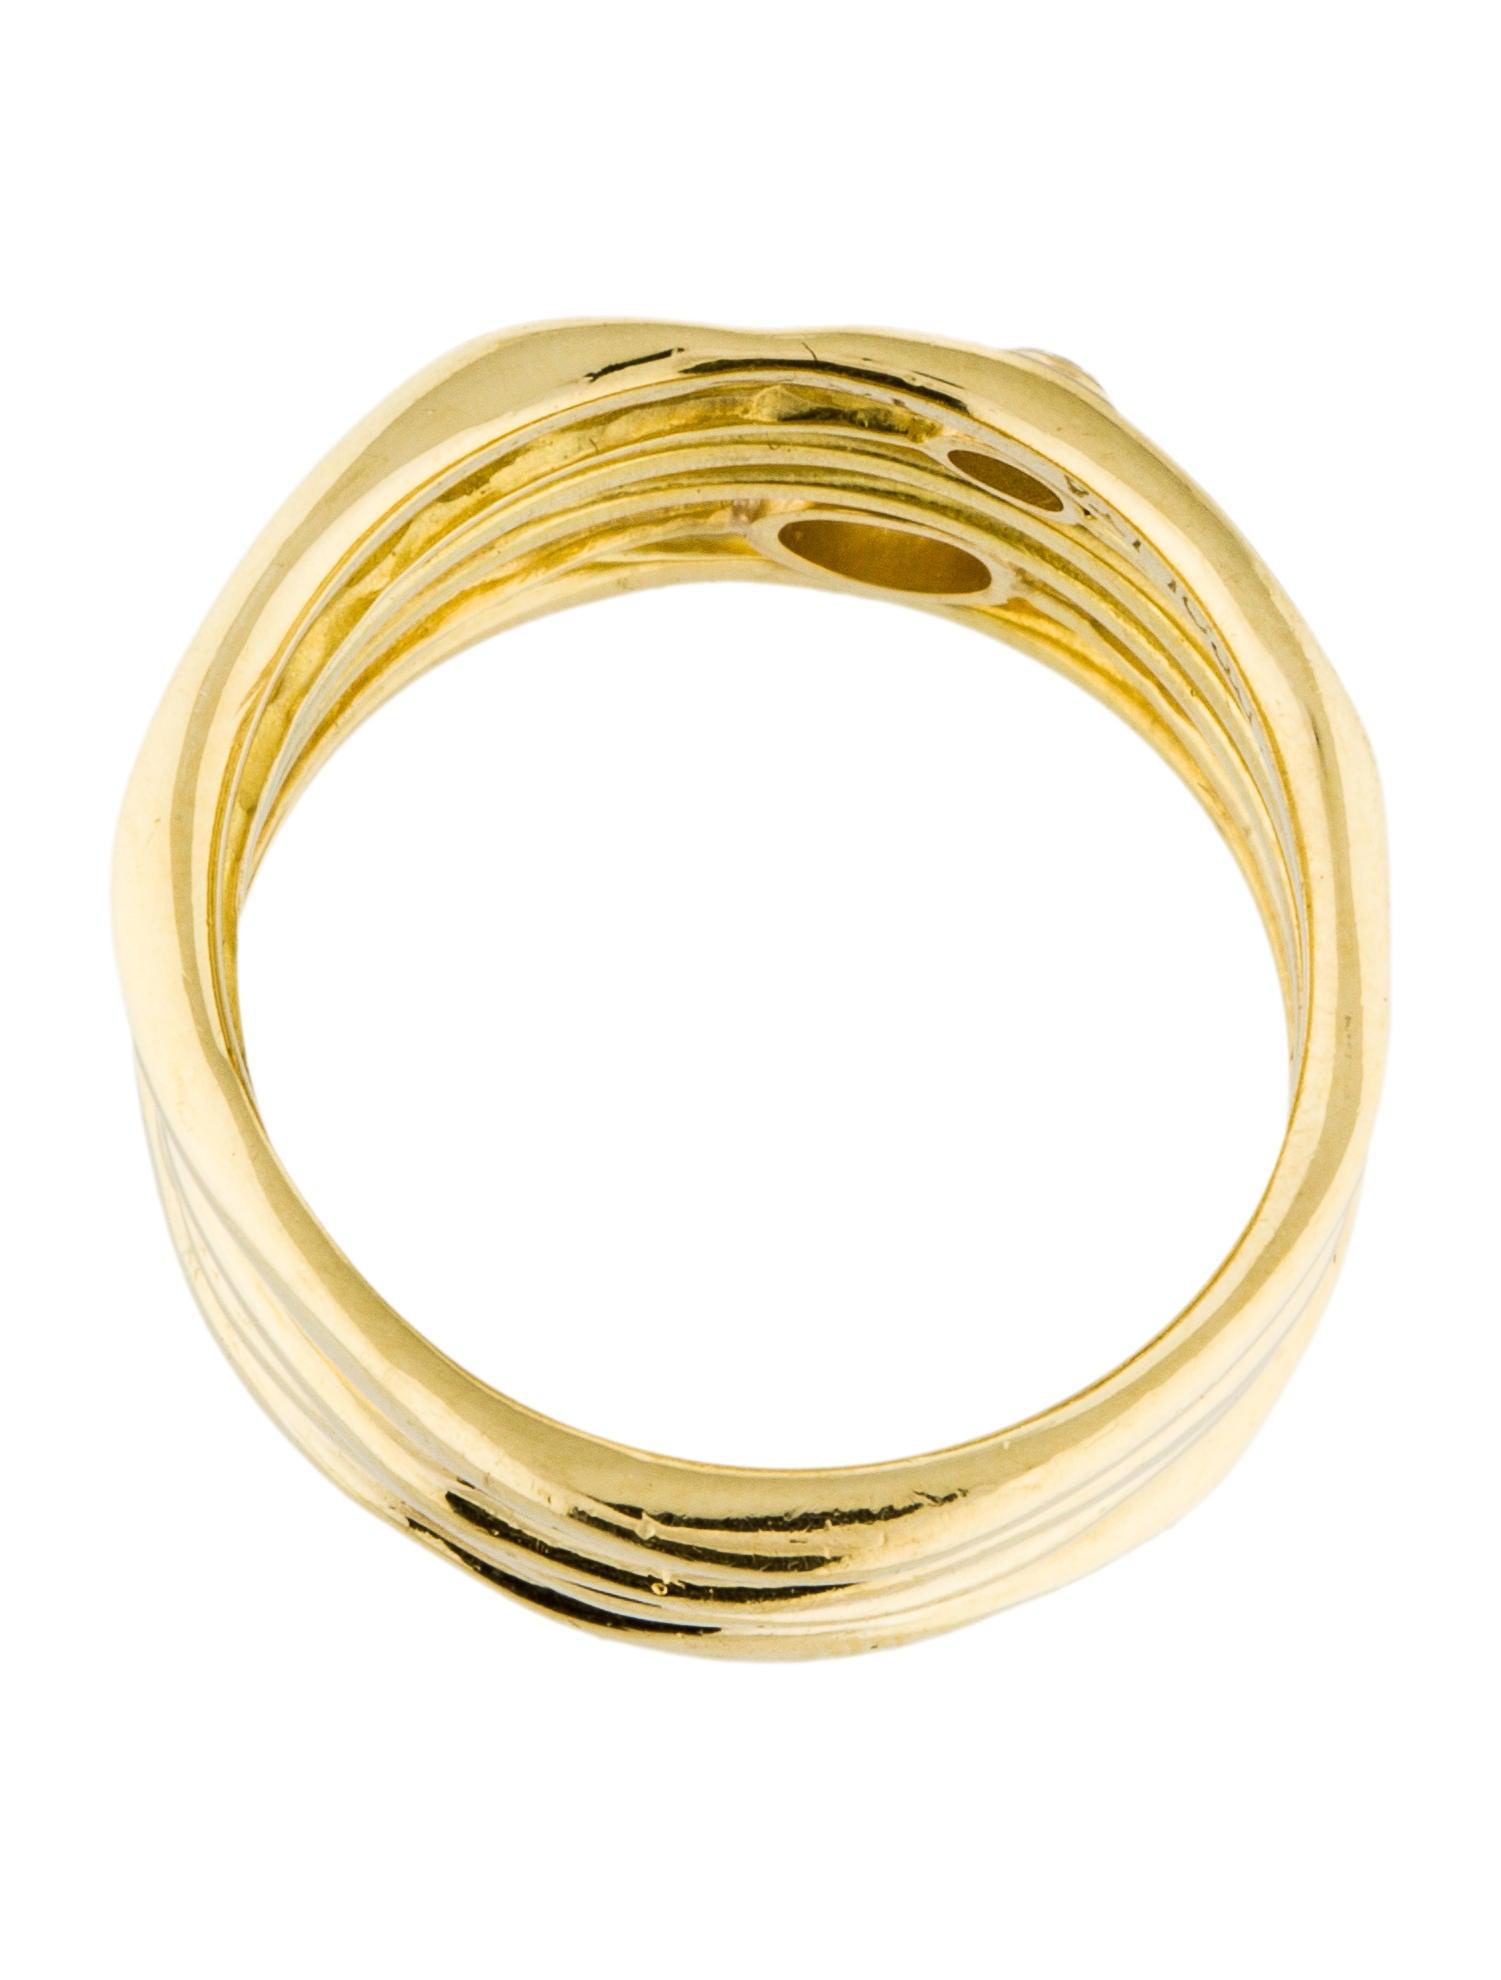 Ippolita 18k Diamond Movie Star Ring  Rings  Ipp26811. Wallpaper Rings. Platinum Brushed Wedding Rings. Piercing Rings. American Jewellers Wedding Wedding Rings. Affordable Diamond Wedding Rings. Bezel Engagement Rings. Atrocitus Rings. Two Band Wedding Rings